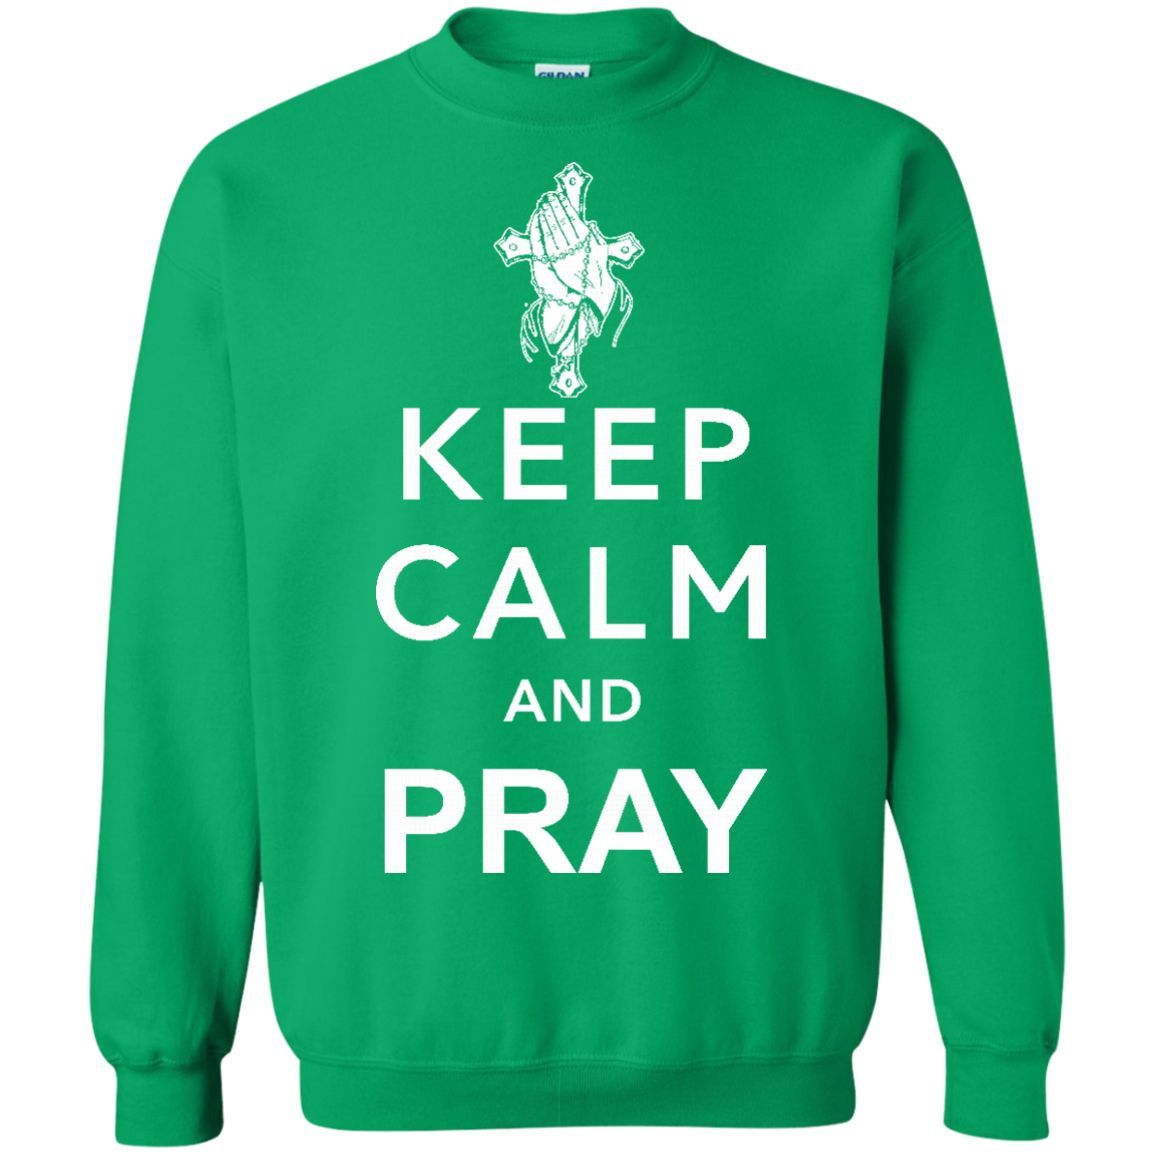 Crewneck pullover sweatshirt 8 oz michigan state